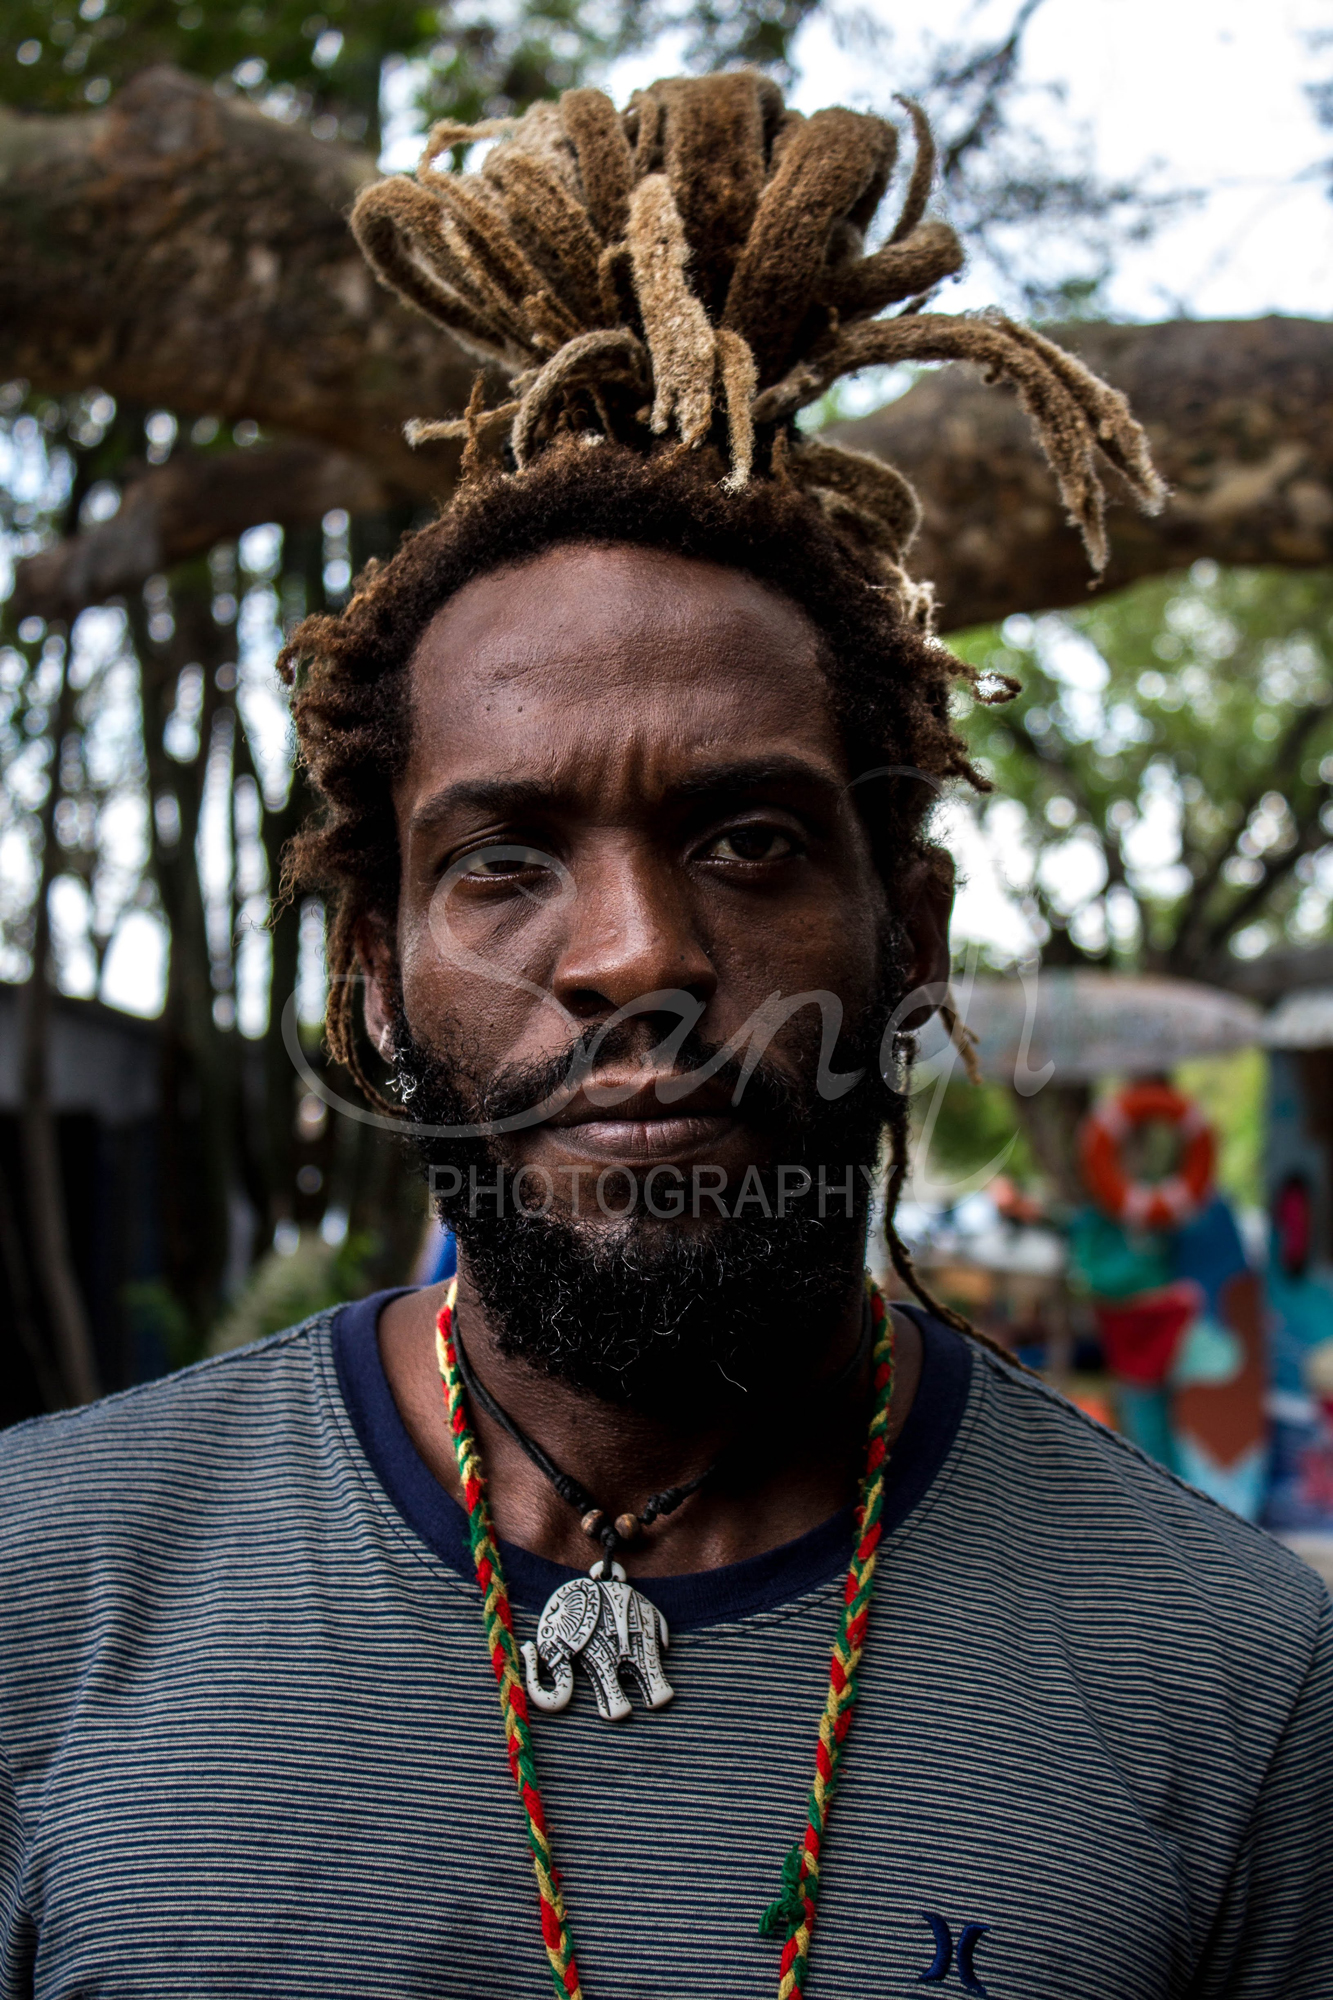 Sandi Photography, Jamaica